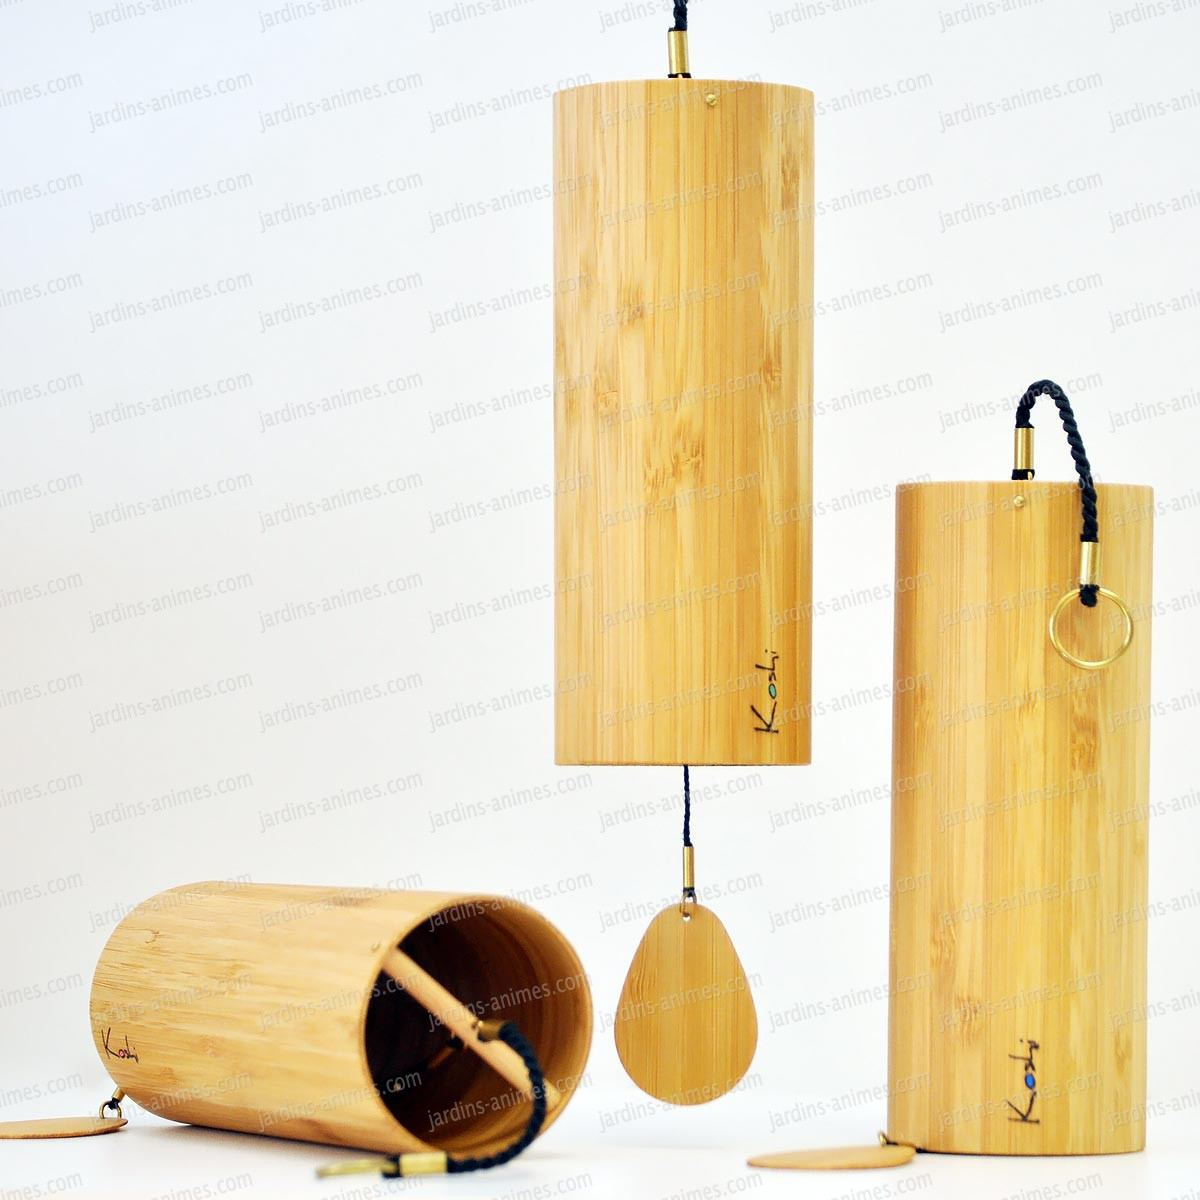 Carillon Koshi Aria tout Carillon Bambou Jardin